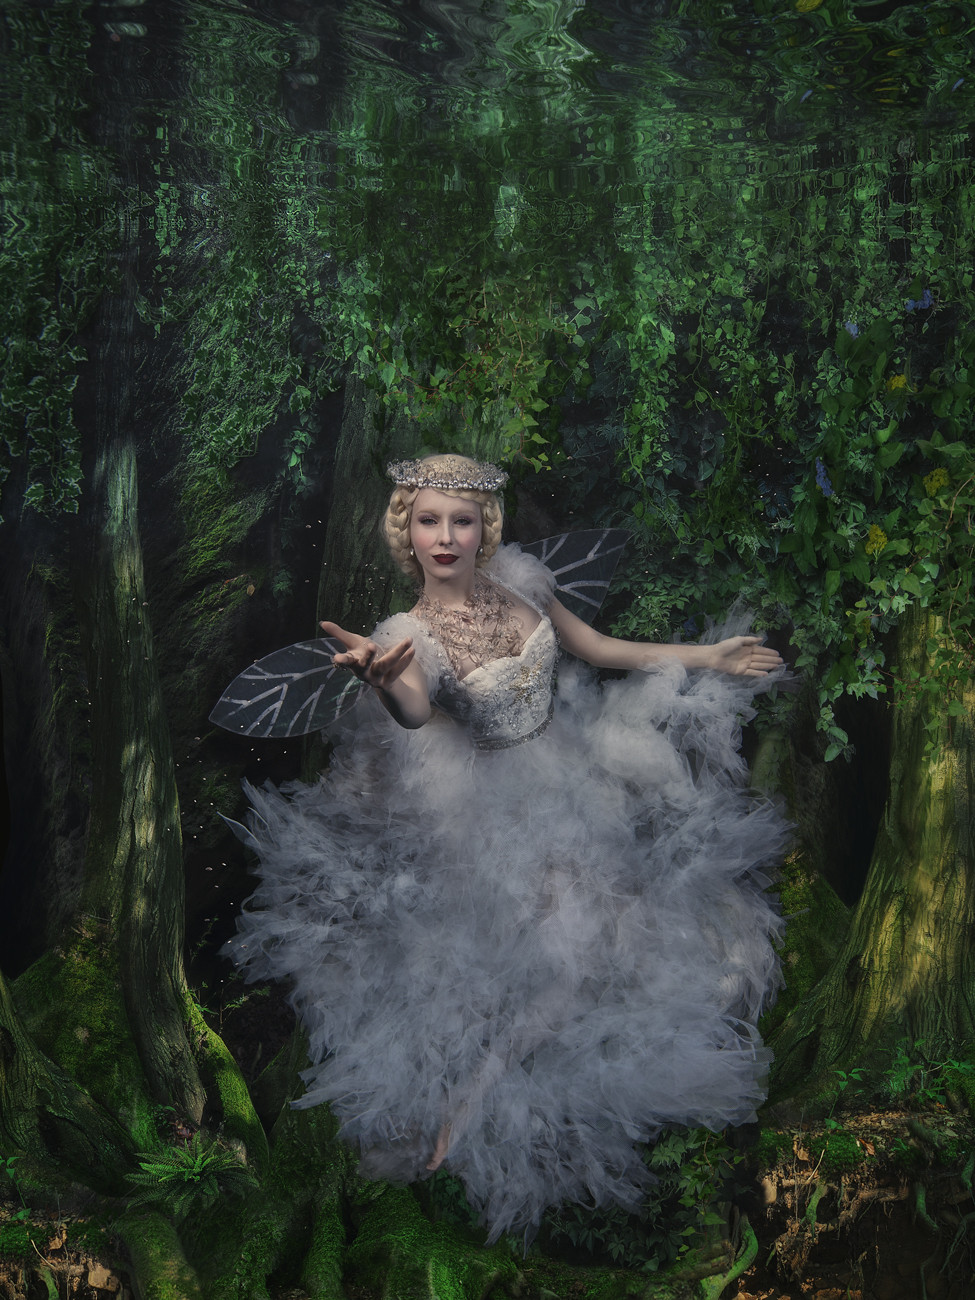 Queen of the Fairies Mab